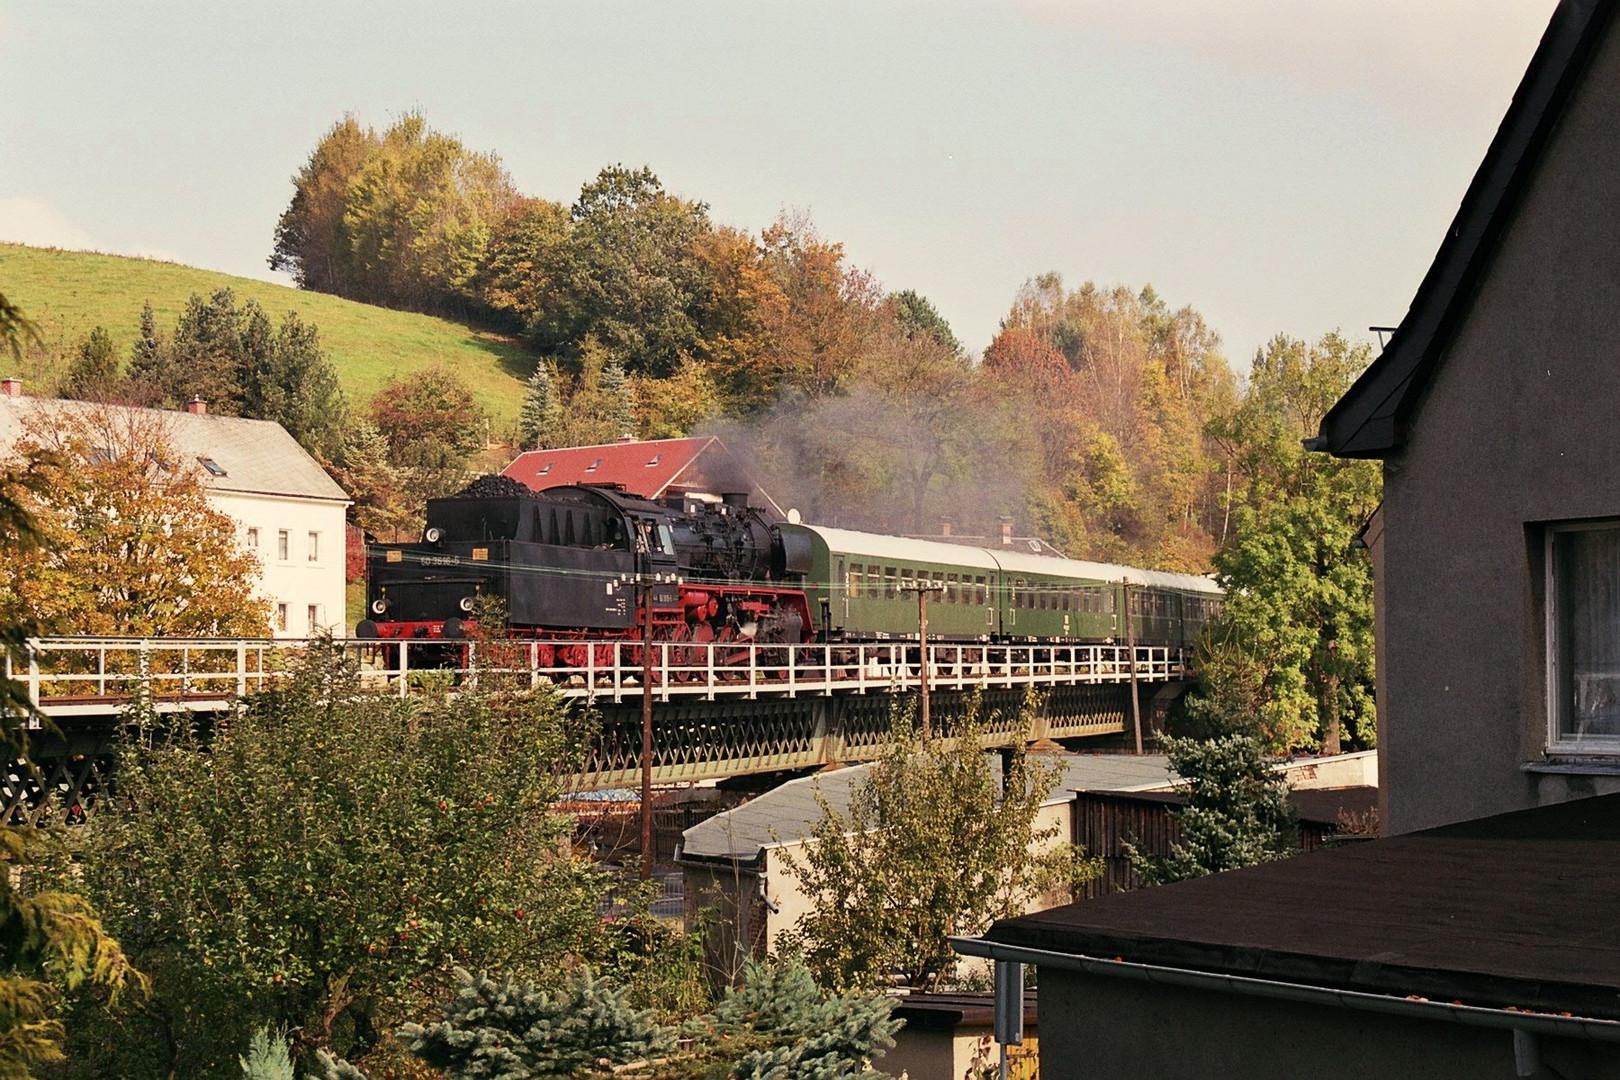 50 er in Raschau